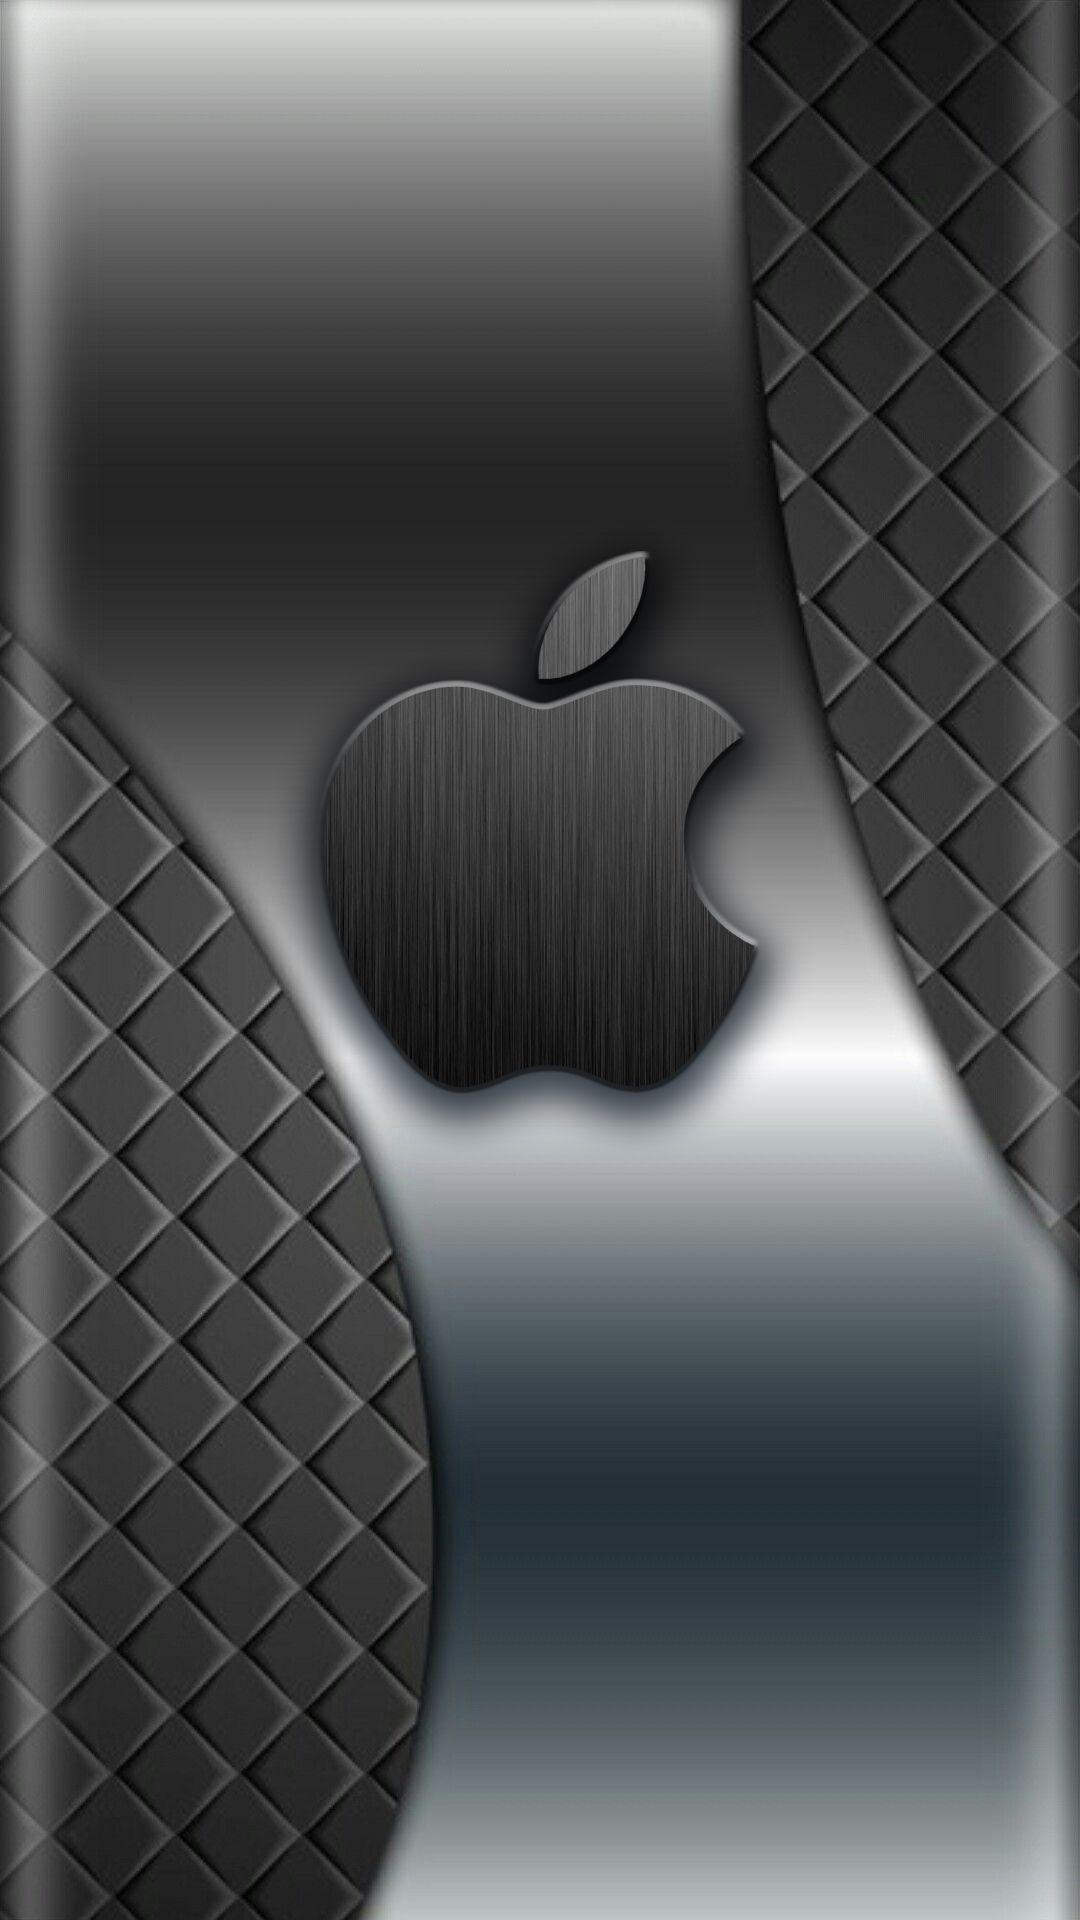 Apple Iphone Wallpaper Hd Apple Logo Wallpaper Apple Wallpaper Iphone